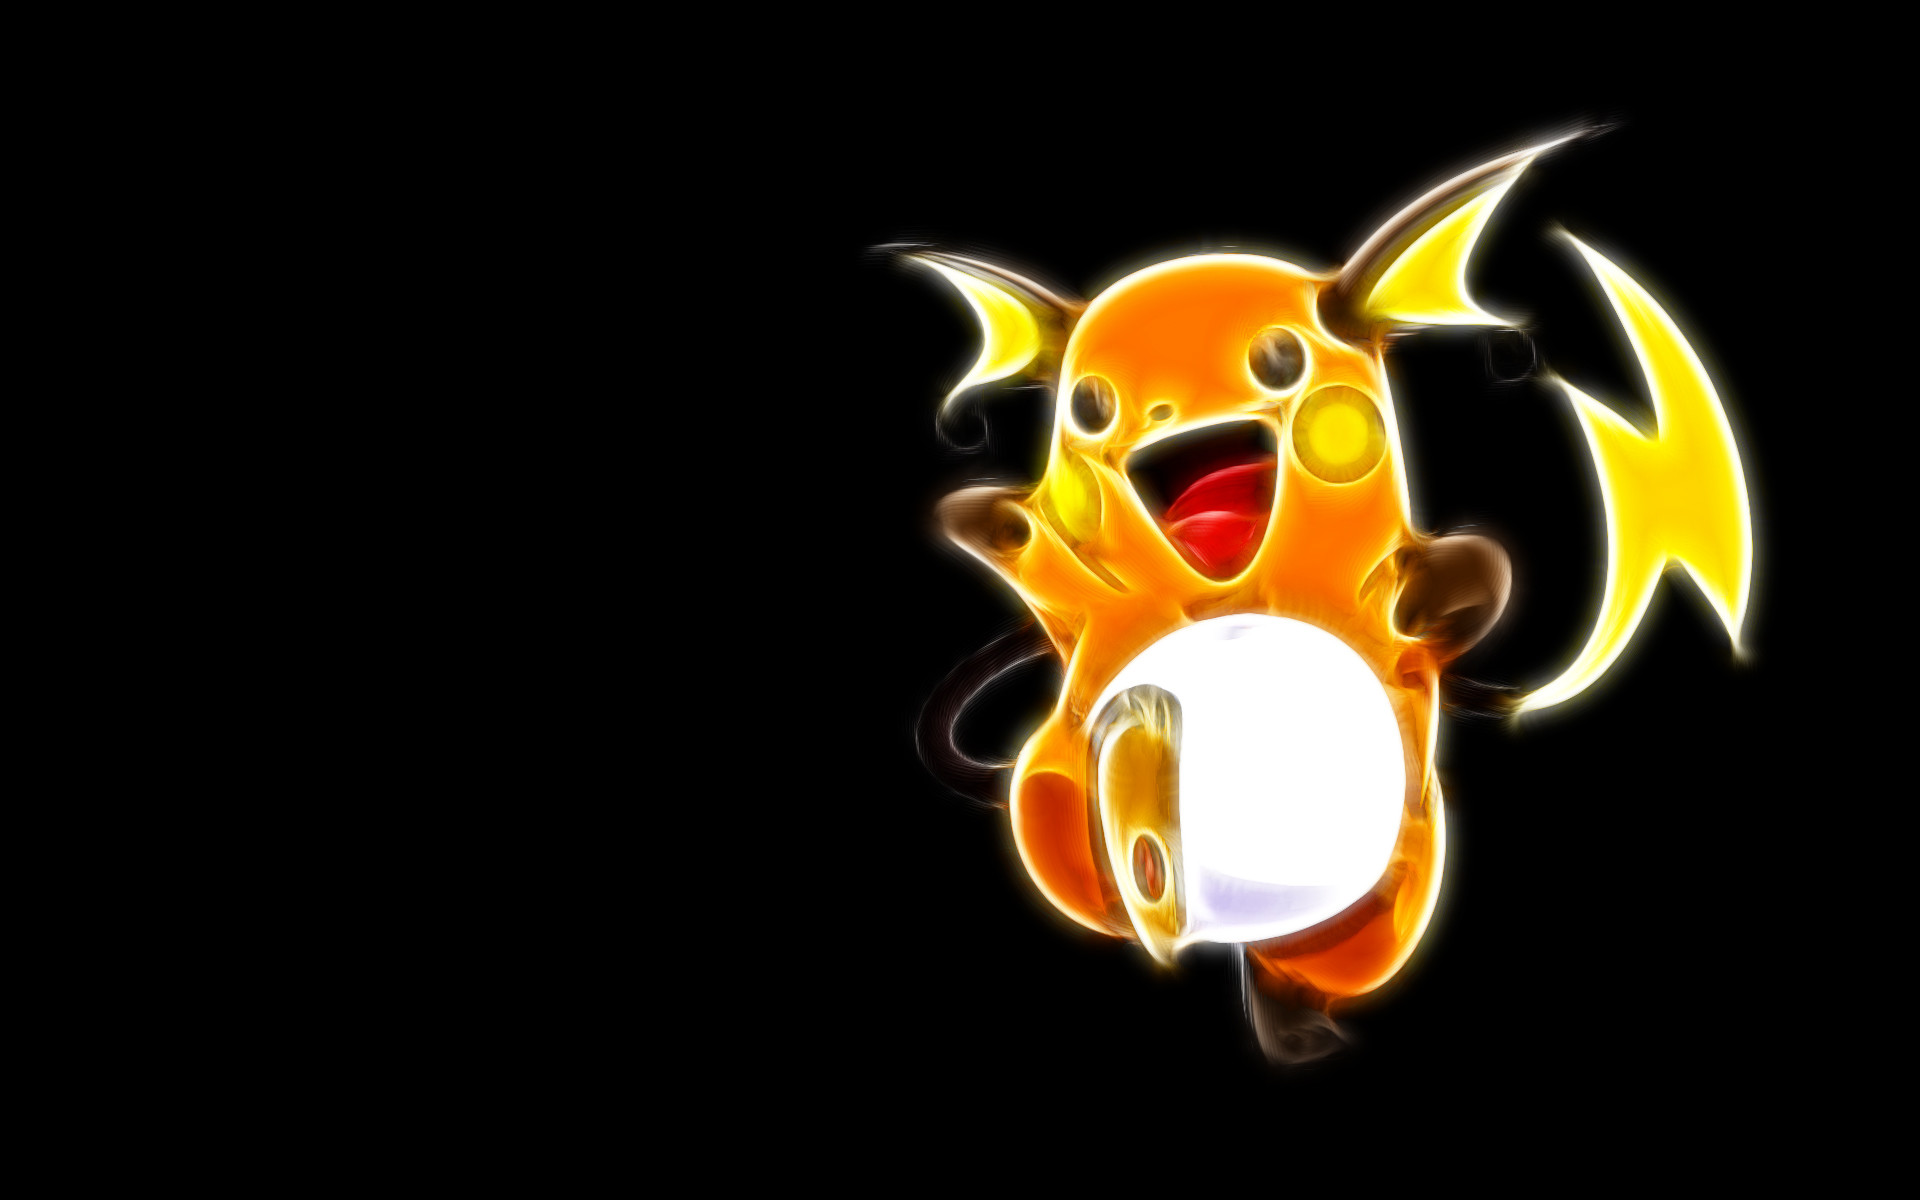 wallpaper for ipad pokemon 3884 wallpapers wallpaper for ipad pokemon .